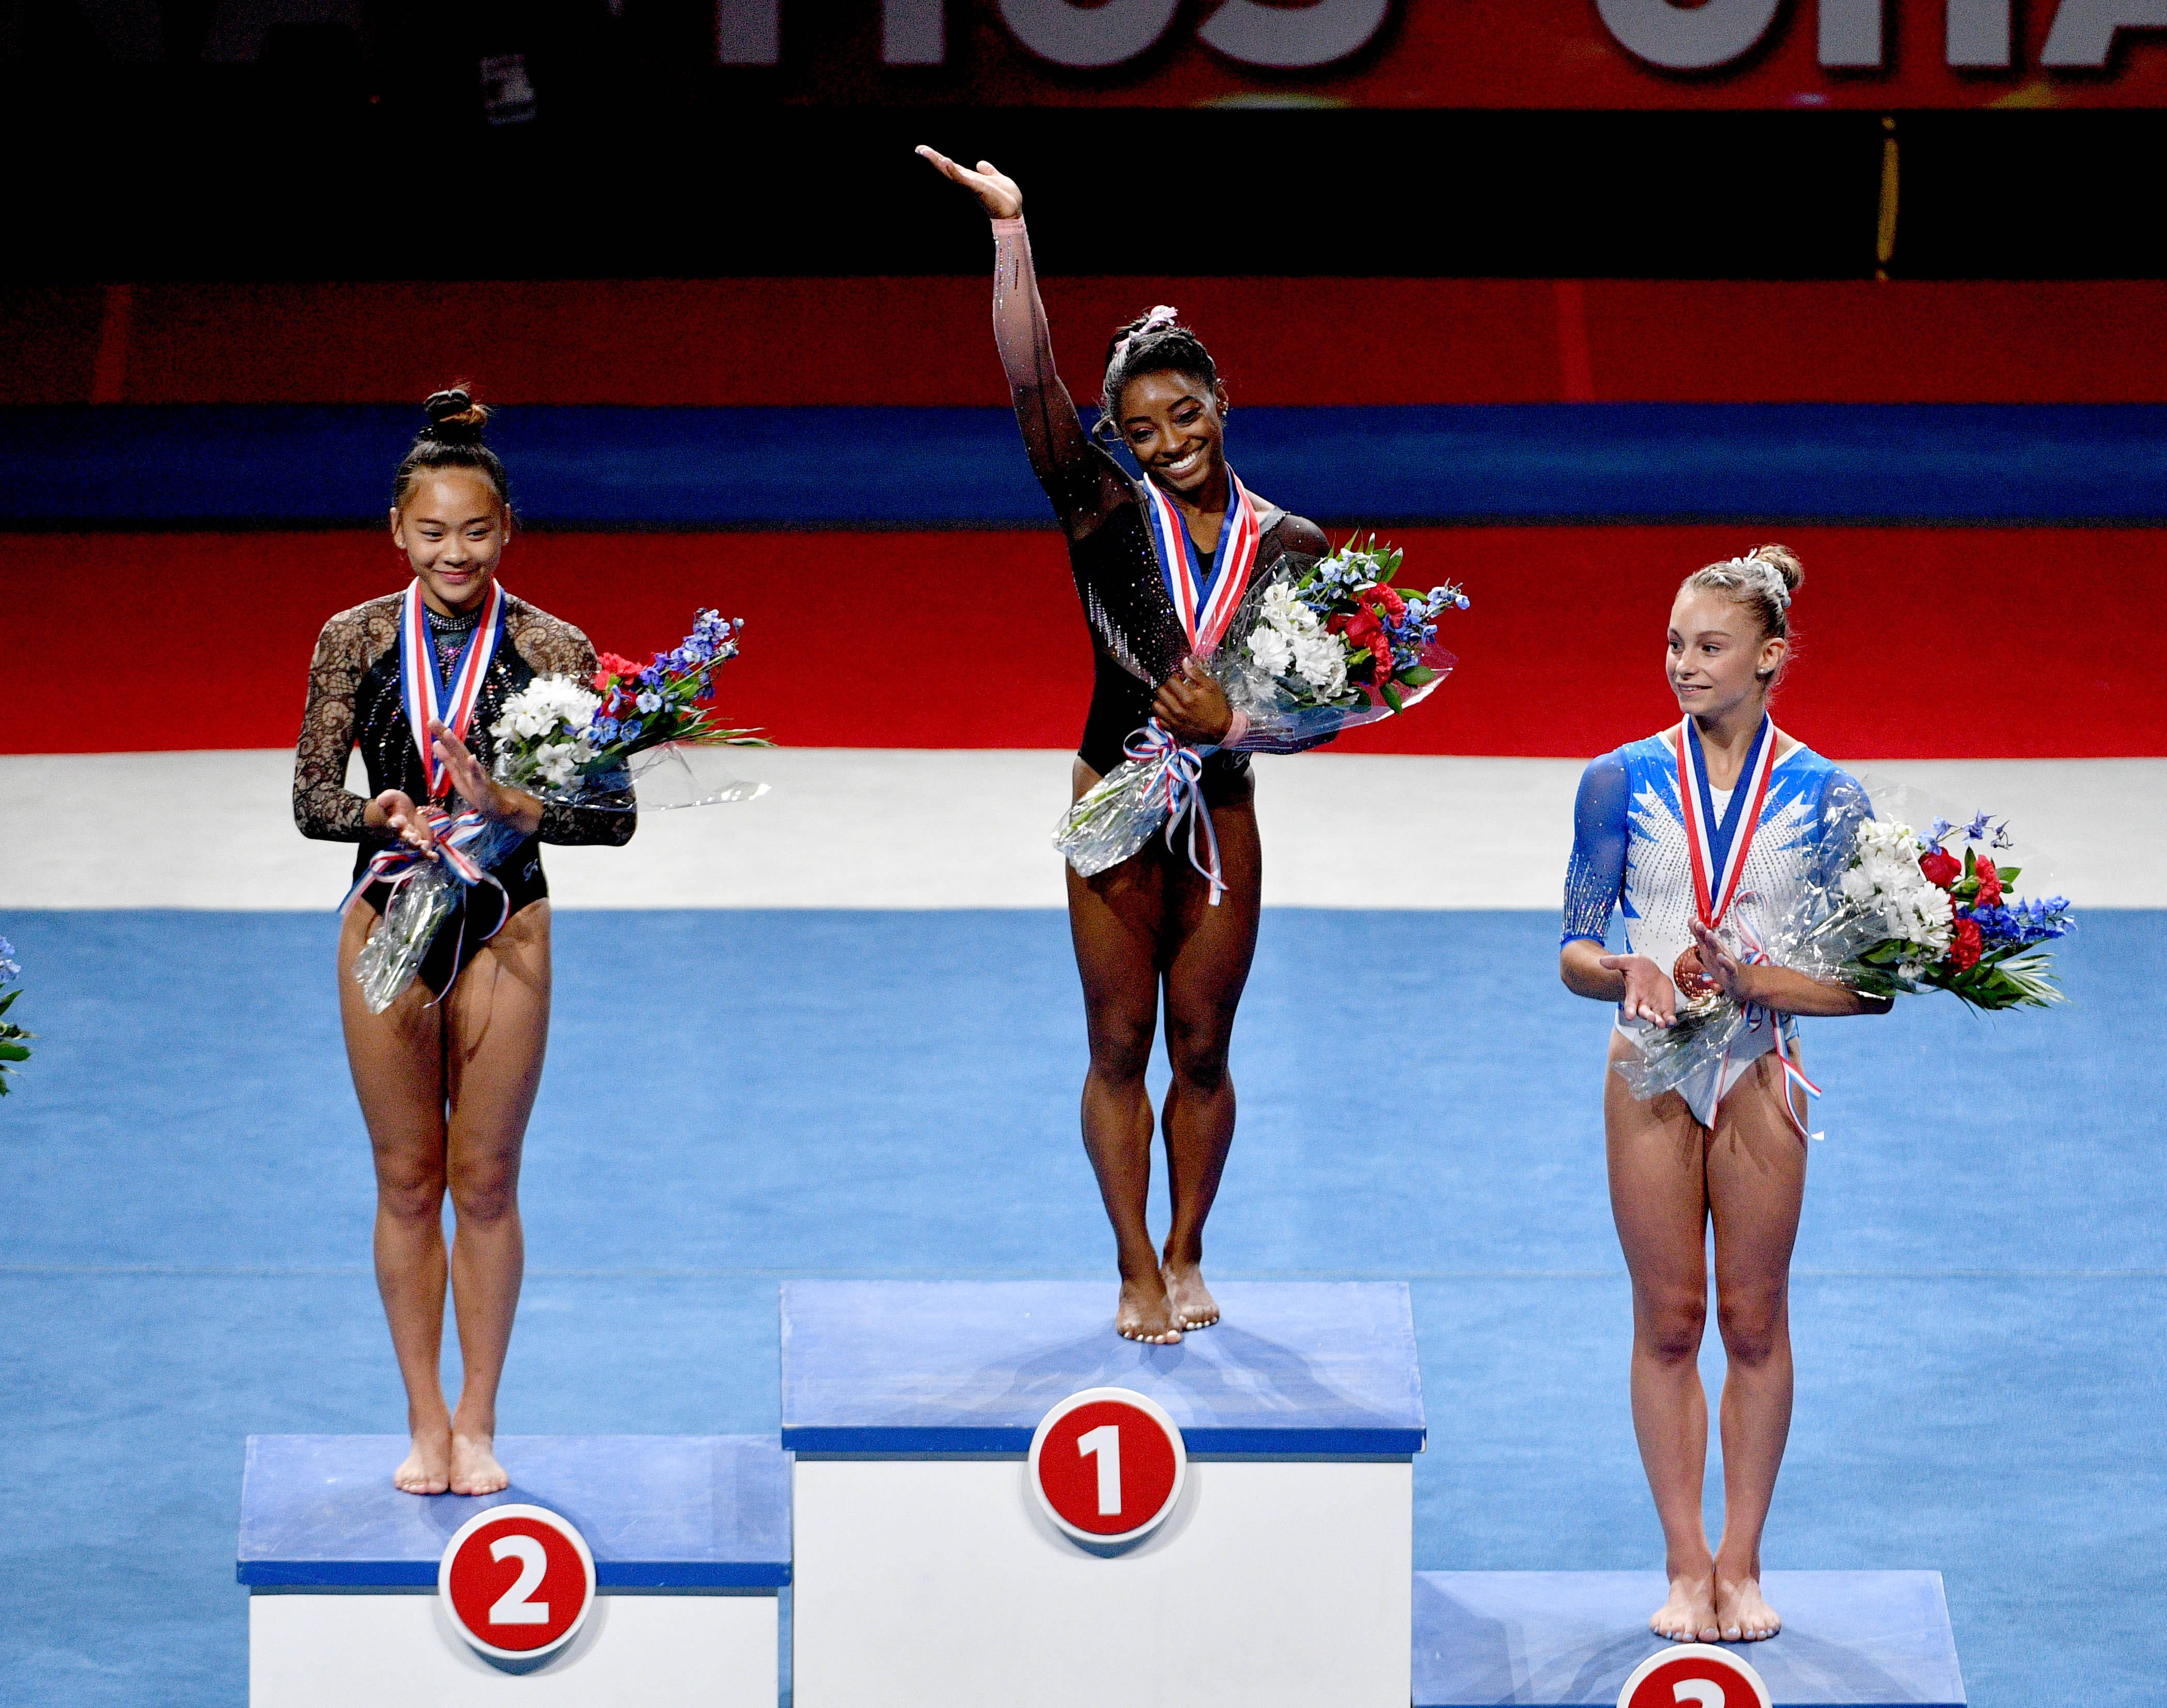 Simone Biles, U.S. national gymnastics team to train in Indy for Olympics